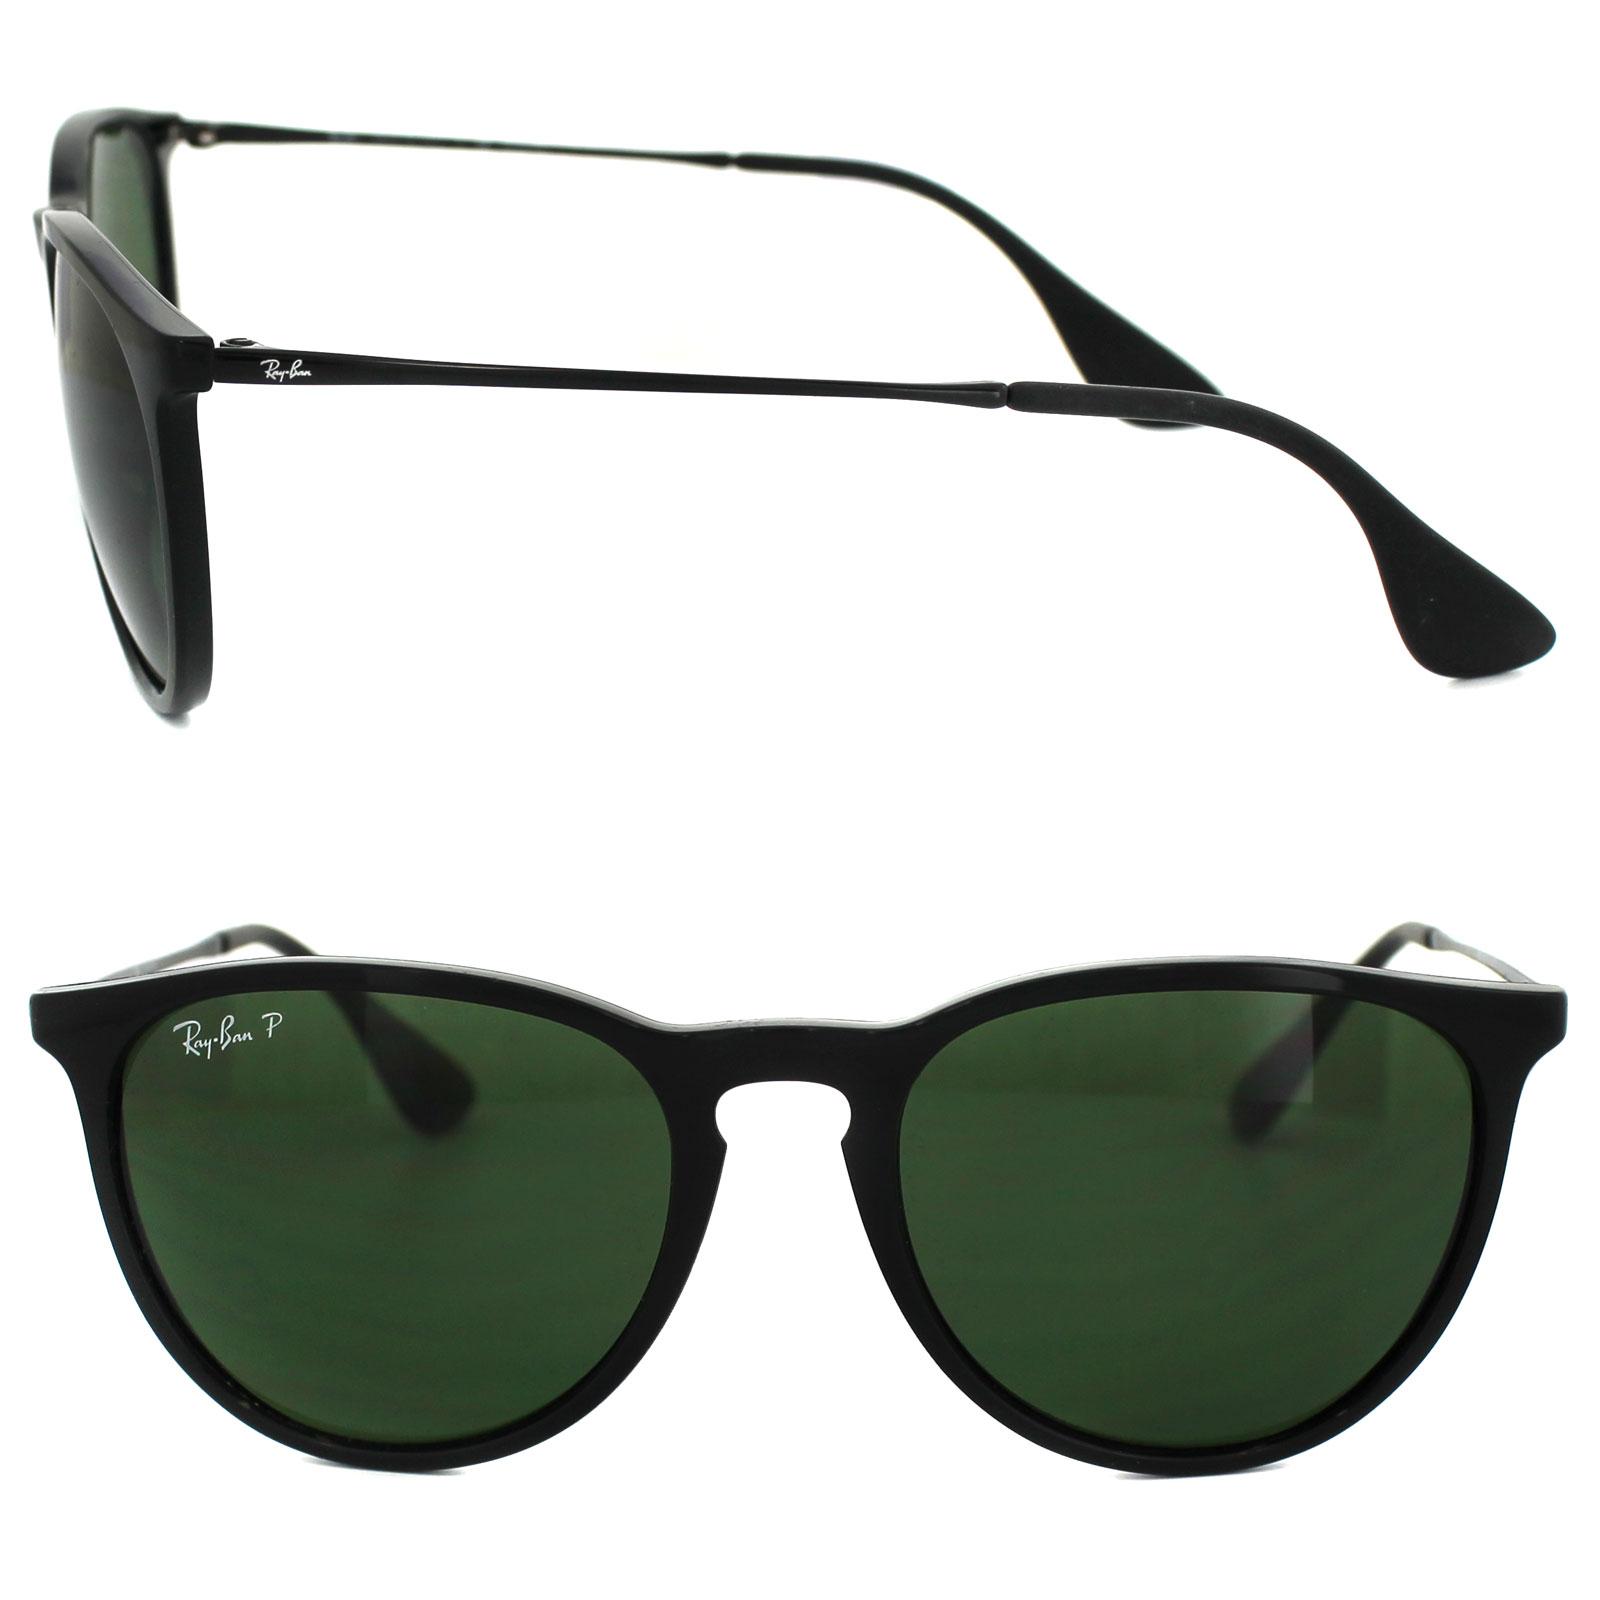 ray ban sunglasses erika 4171 601 2p black green polarized ebay. Black Bedroom Furniture Sets. Home Design Ideas